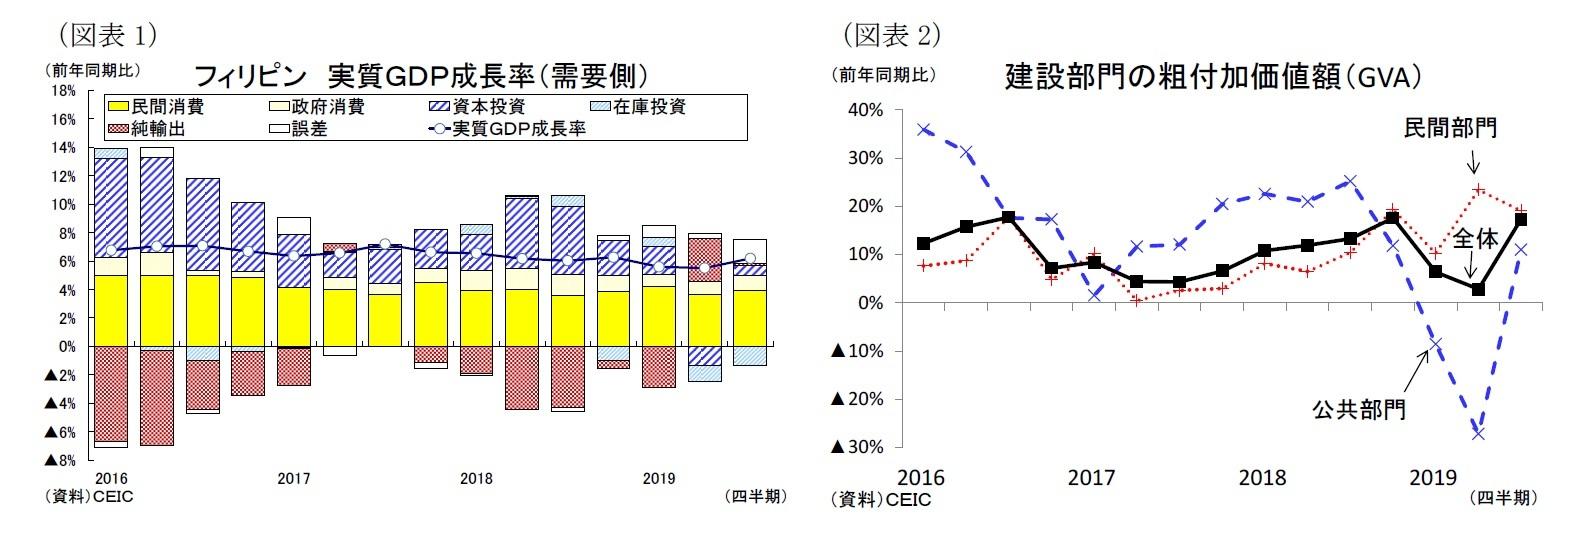 (図表1)フィリピン 実質GDP成長率(需要側)/(図表2)建設部門の粗付加価値額(GVA)